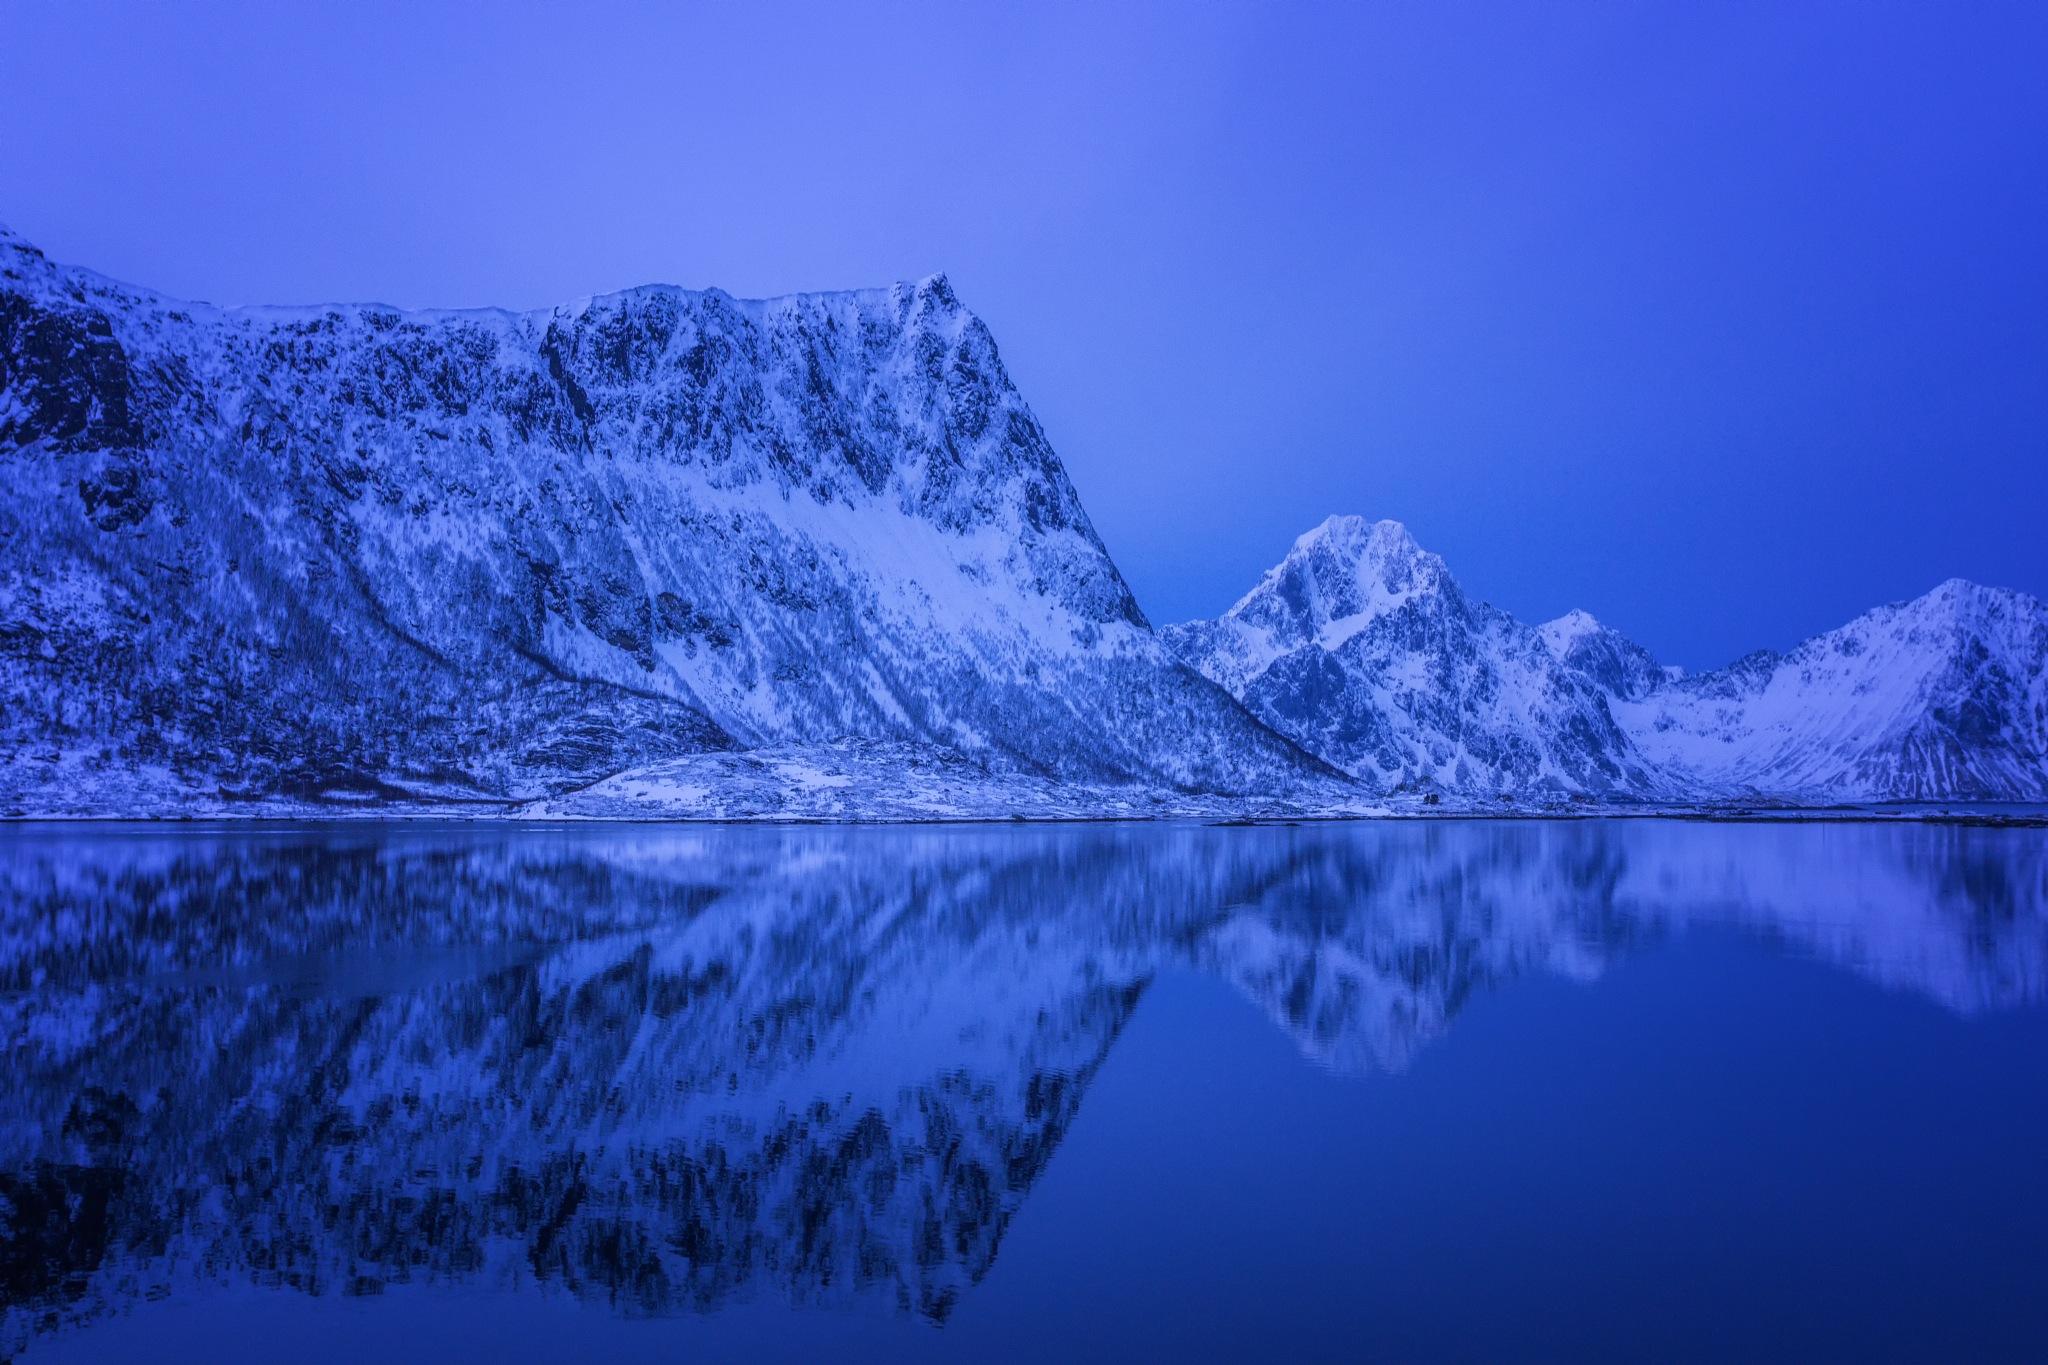 Blue Hour by Rickard A. Eriksson